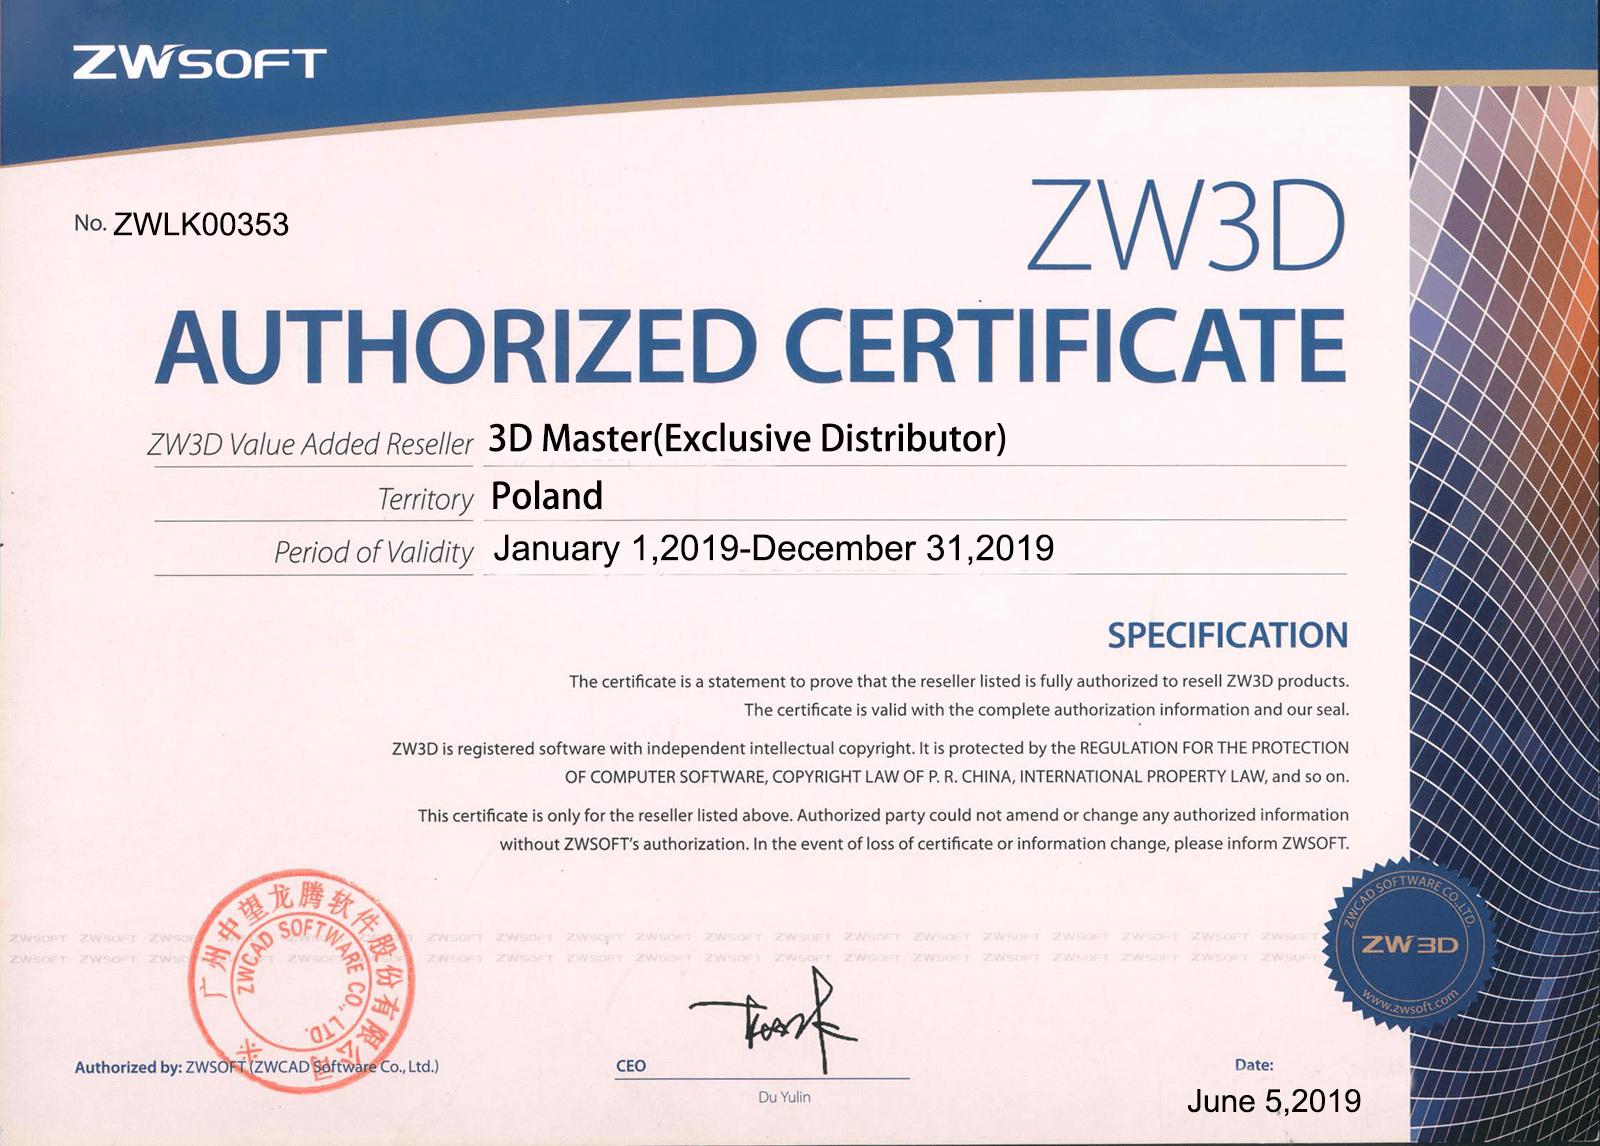 Certyfikat ZWSOFT dla 3D Master 2019